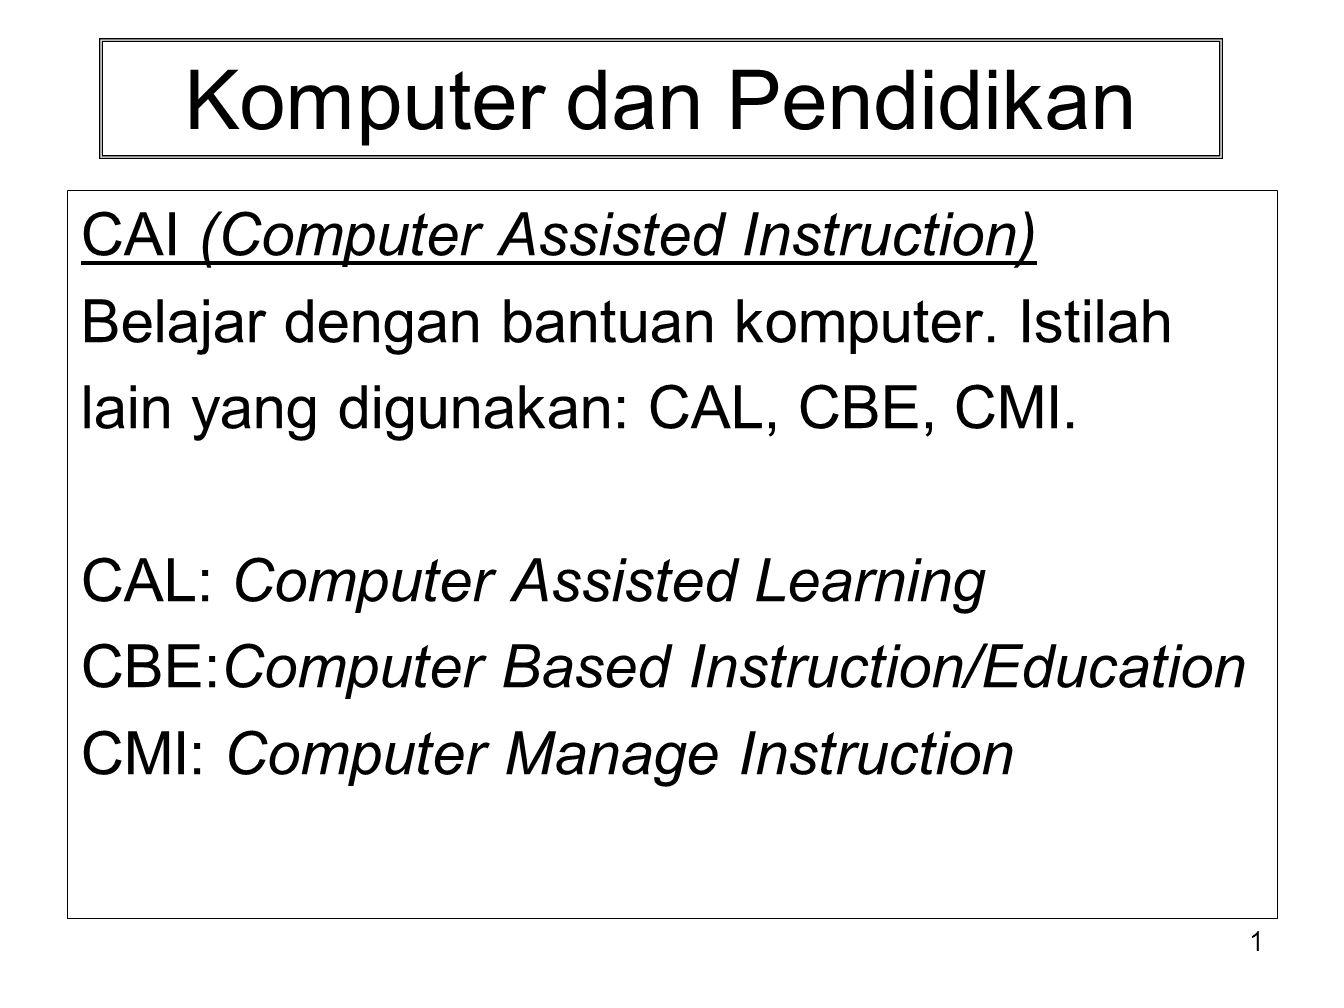 1 Komputer dan Pendidikan CAI (Computer Assisted Instruction) Belajar dengan bantuan komputer. Istilah lain yang digunakan: CAL, CBE, CMI. CAL: Comput